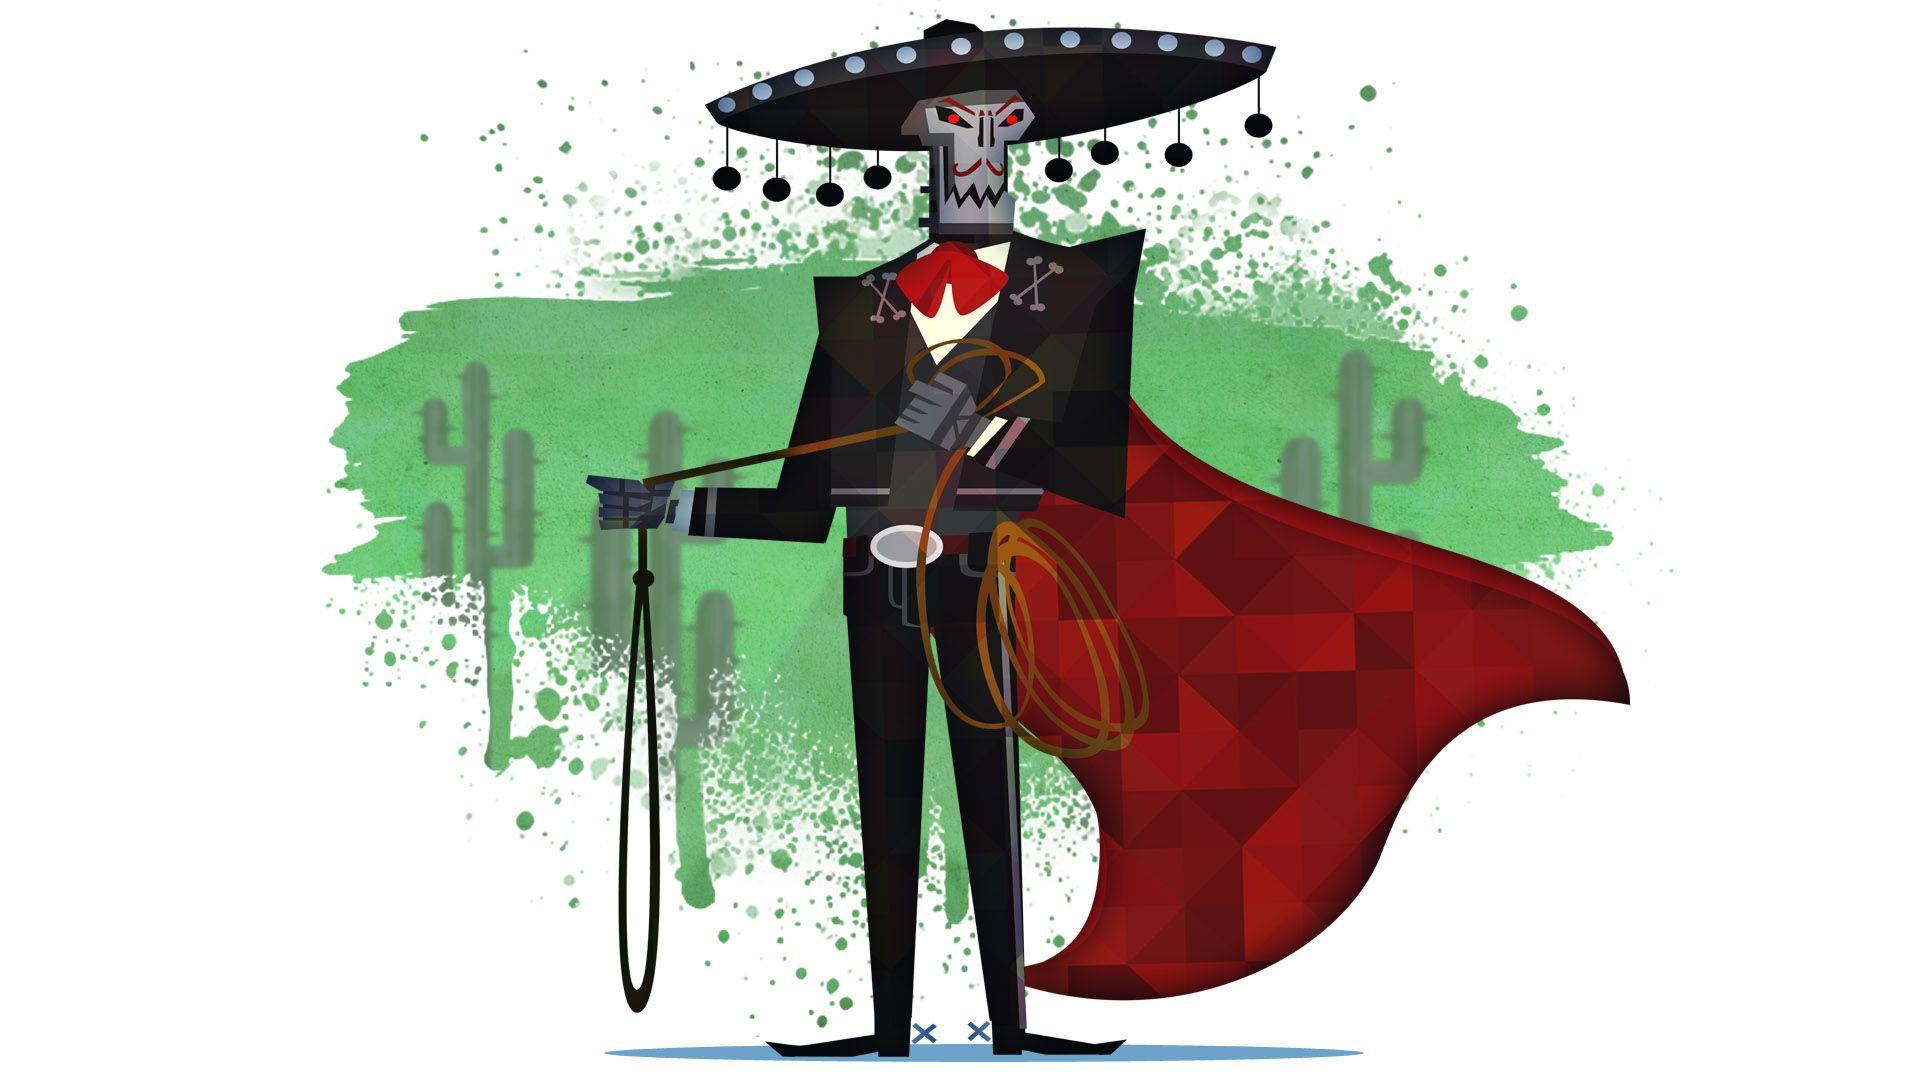 Carlos Calaca Guacamelee 2d Game Art Game Concept Art Adventure Picture